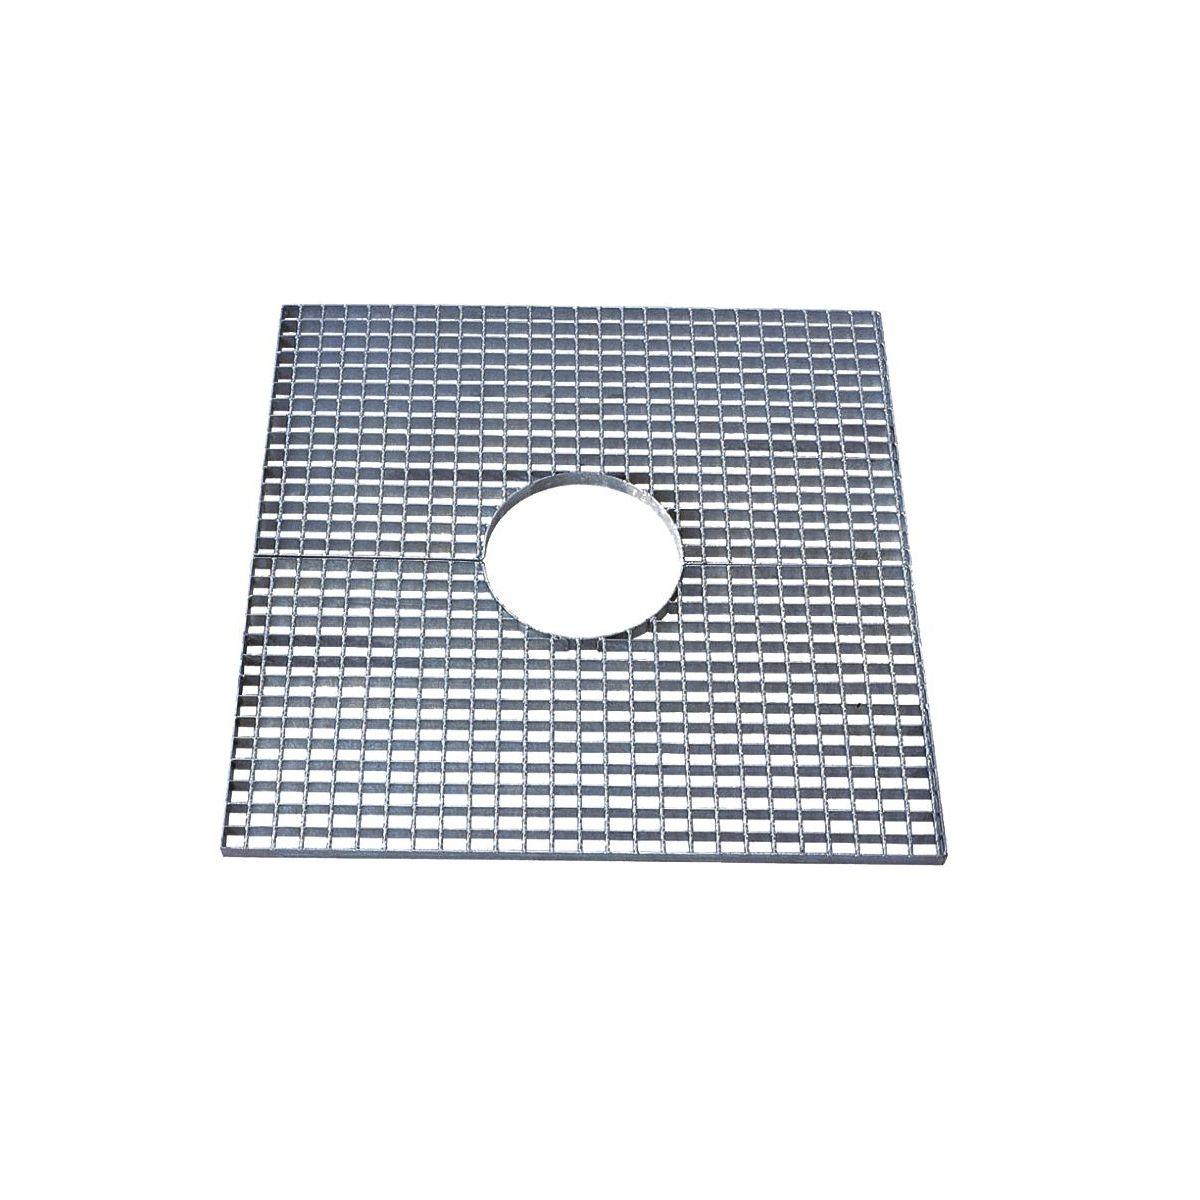 Alcorque religa 600x600mm - C22A